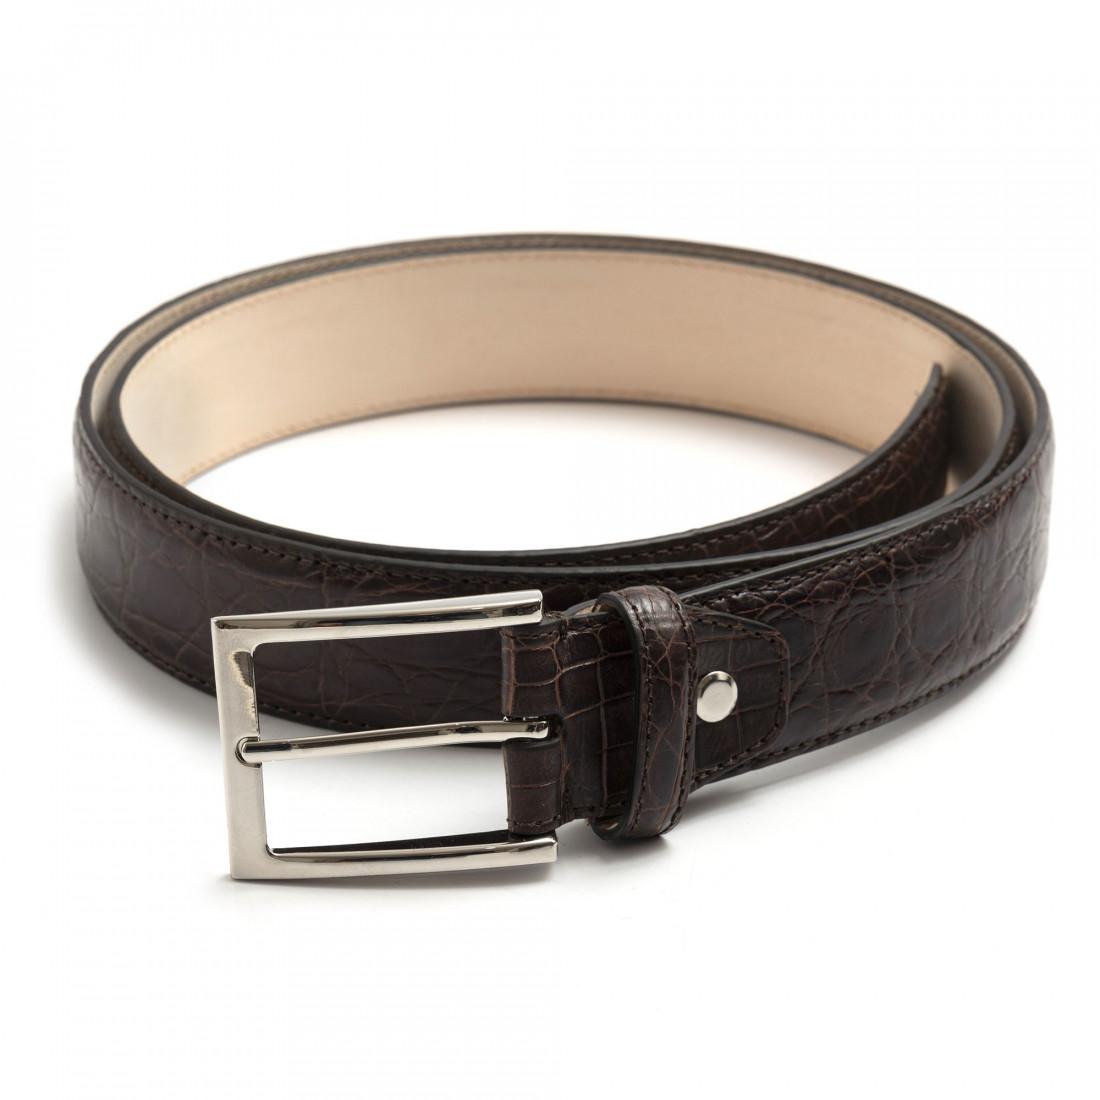 belts man sangiorgio 1300cocco tdm 7980